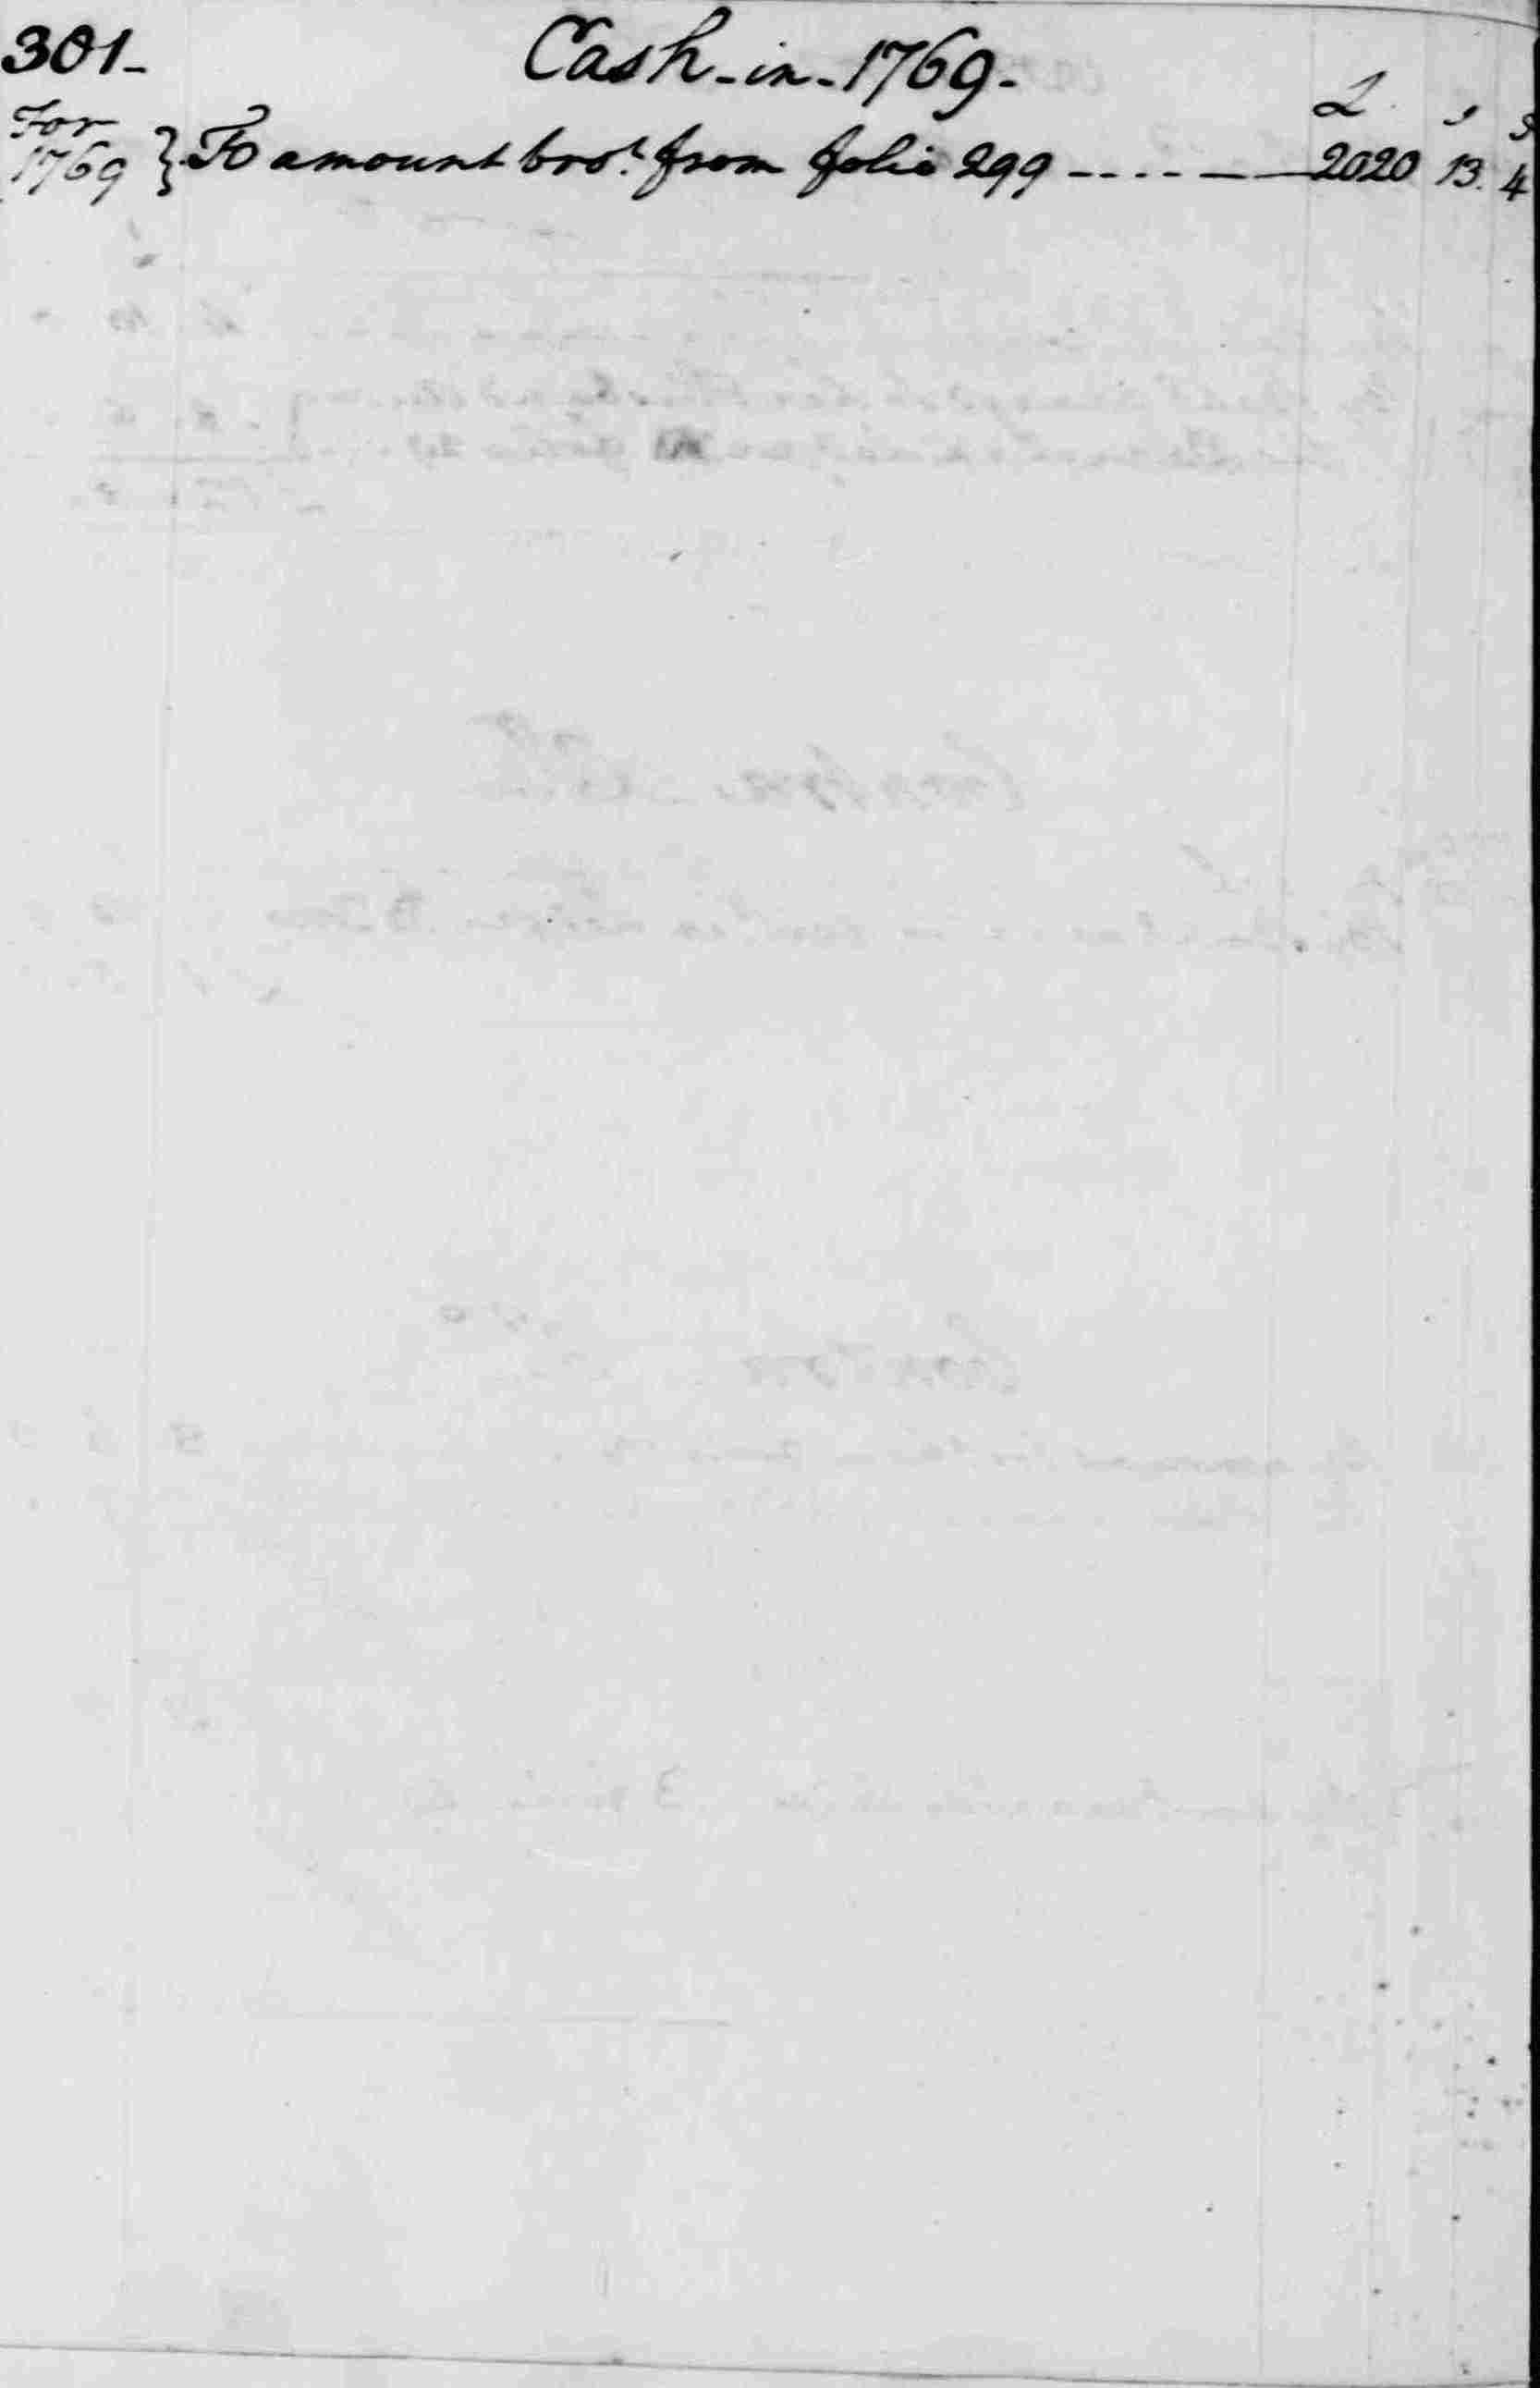 Ledger A, folio 301, left side